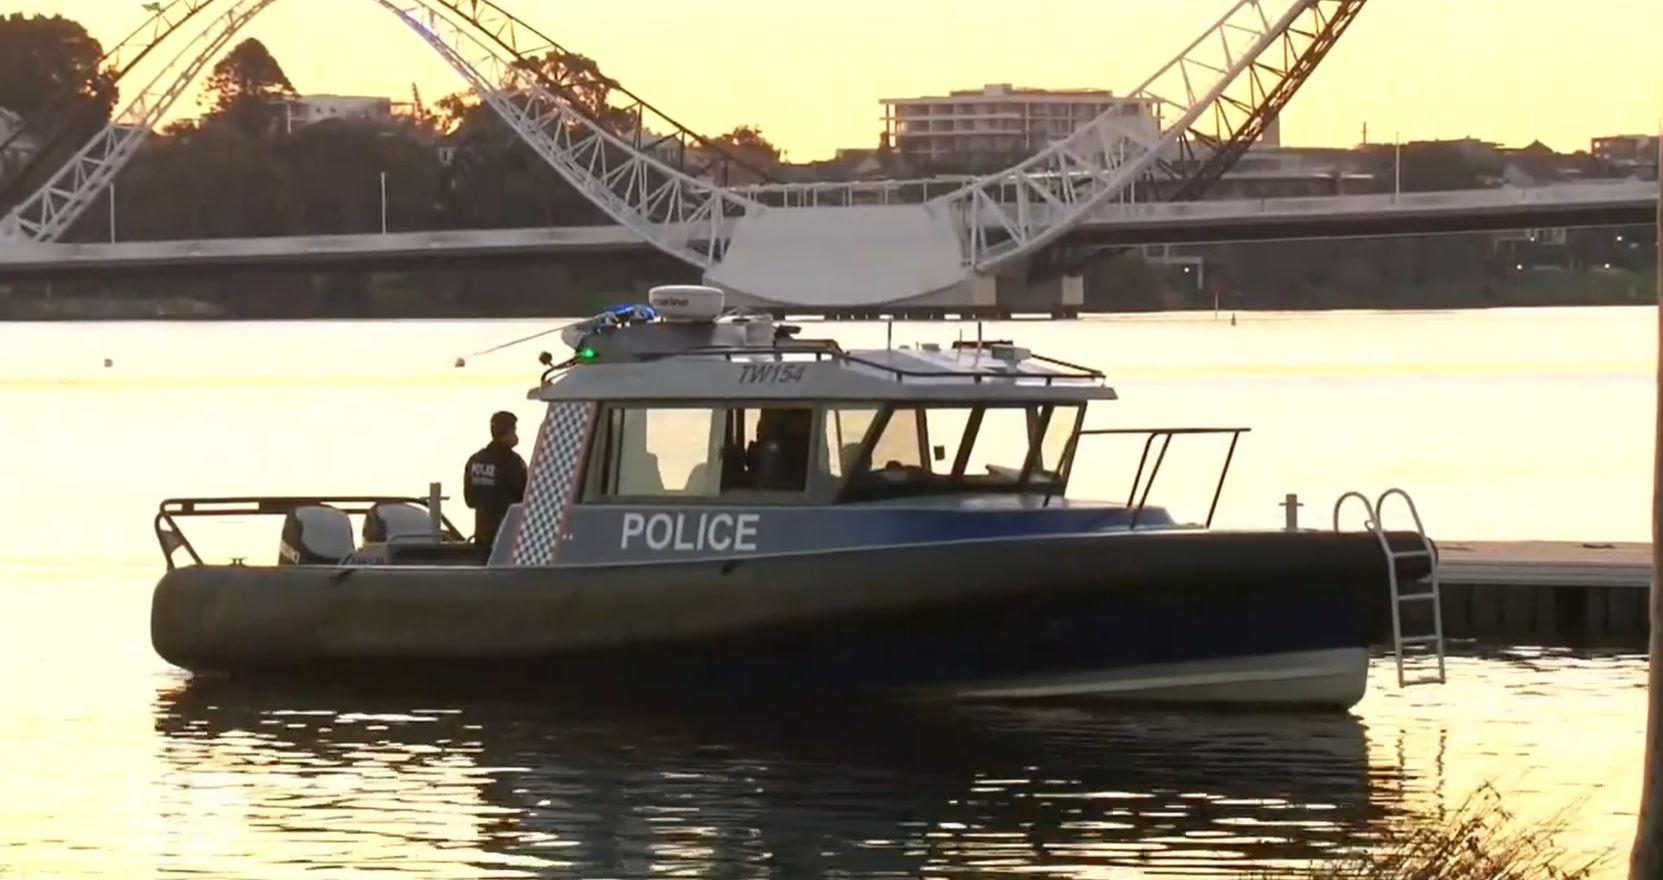 Man's body found in Western Australia's Swan River